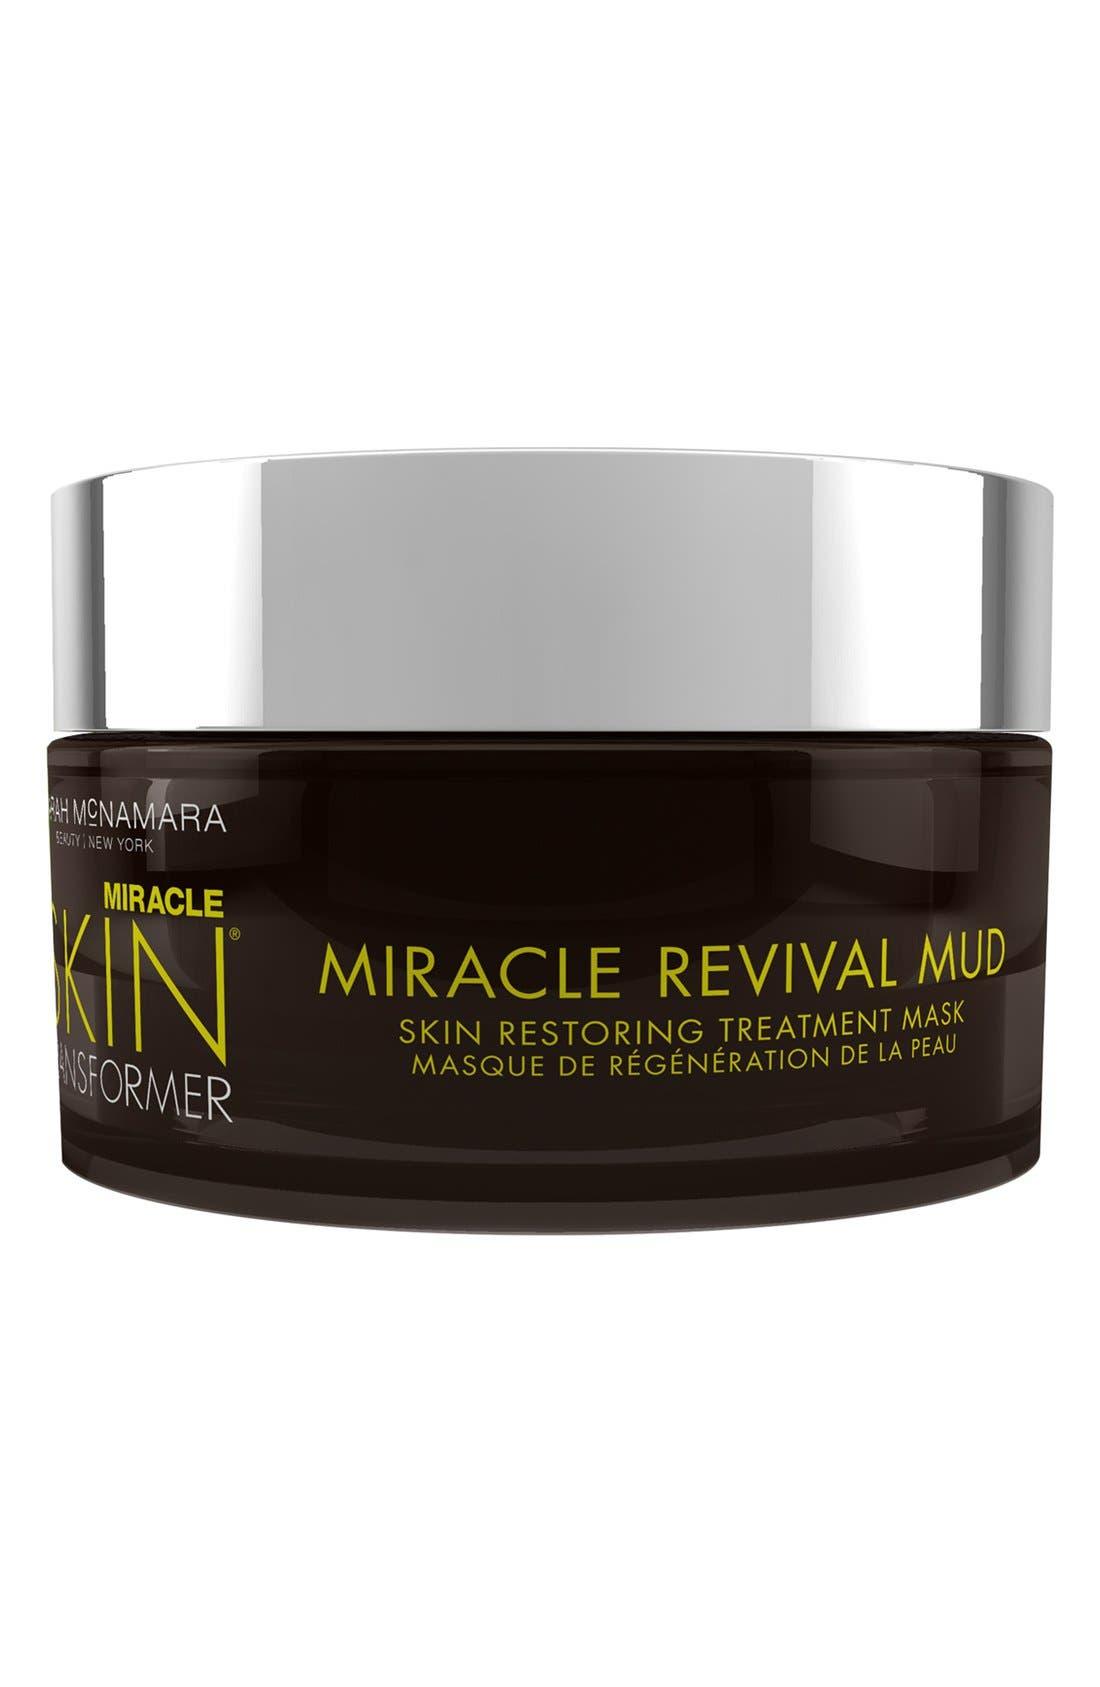 Miracle Skin® Transformer 'Miracle Revival Mud' Skin Restoring Treatment Mask